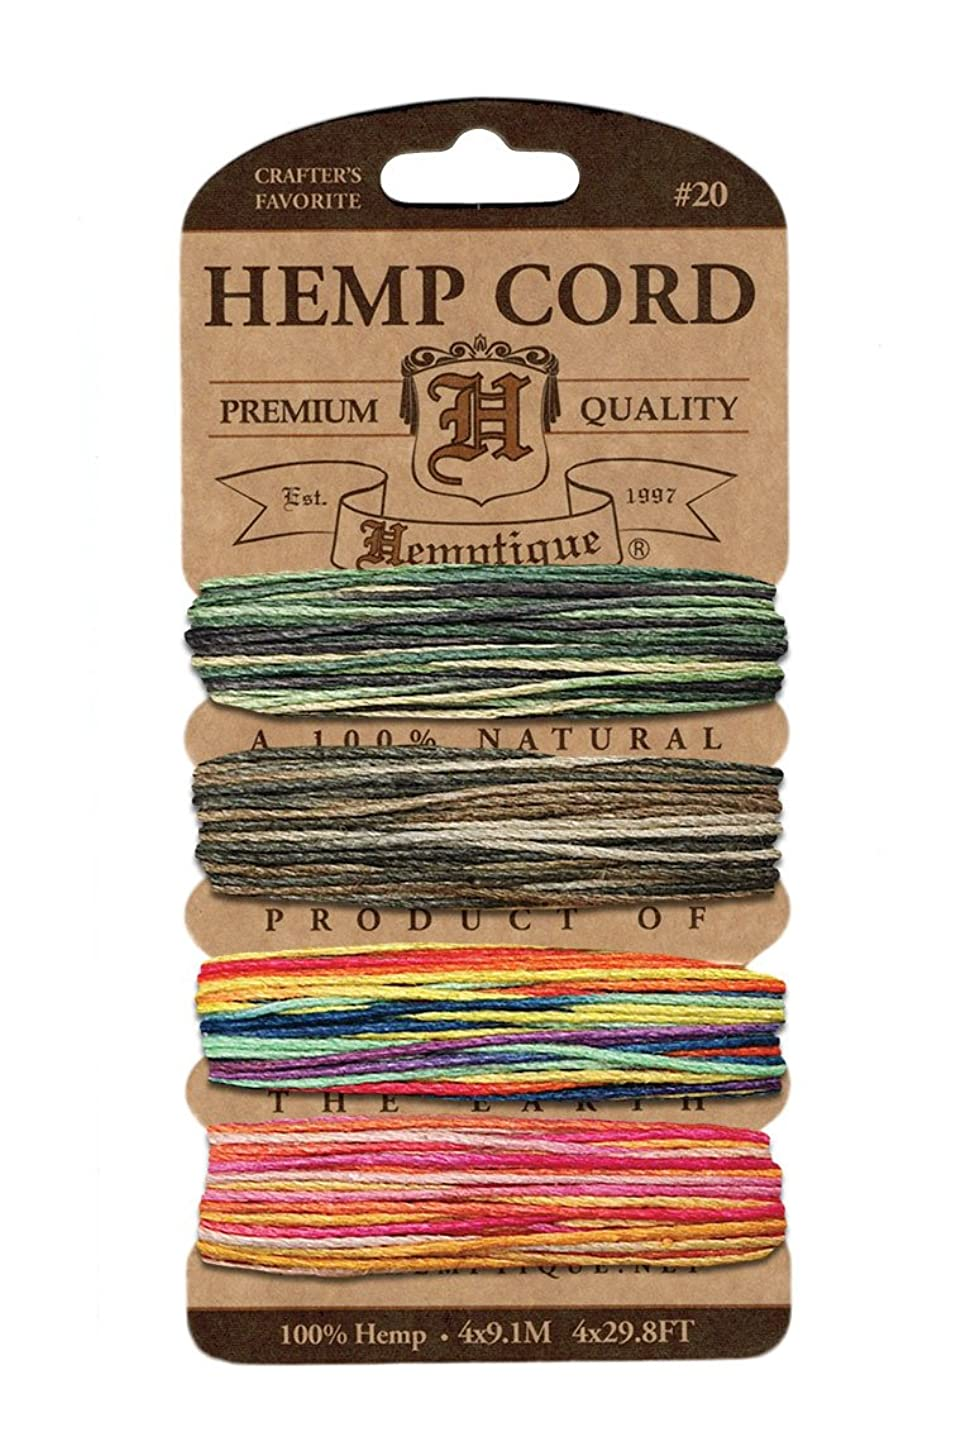 Hemptique H20-MFEST Hemp Cord Card 20 - Metallic Festive Occasion umotddlkipk3